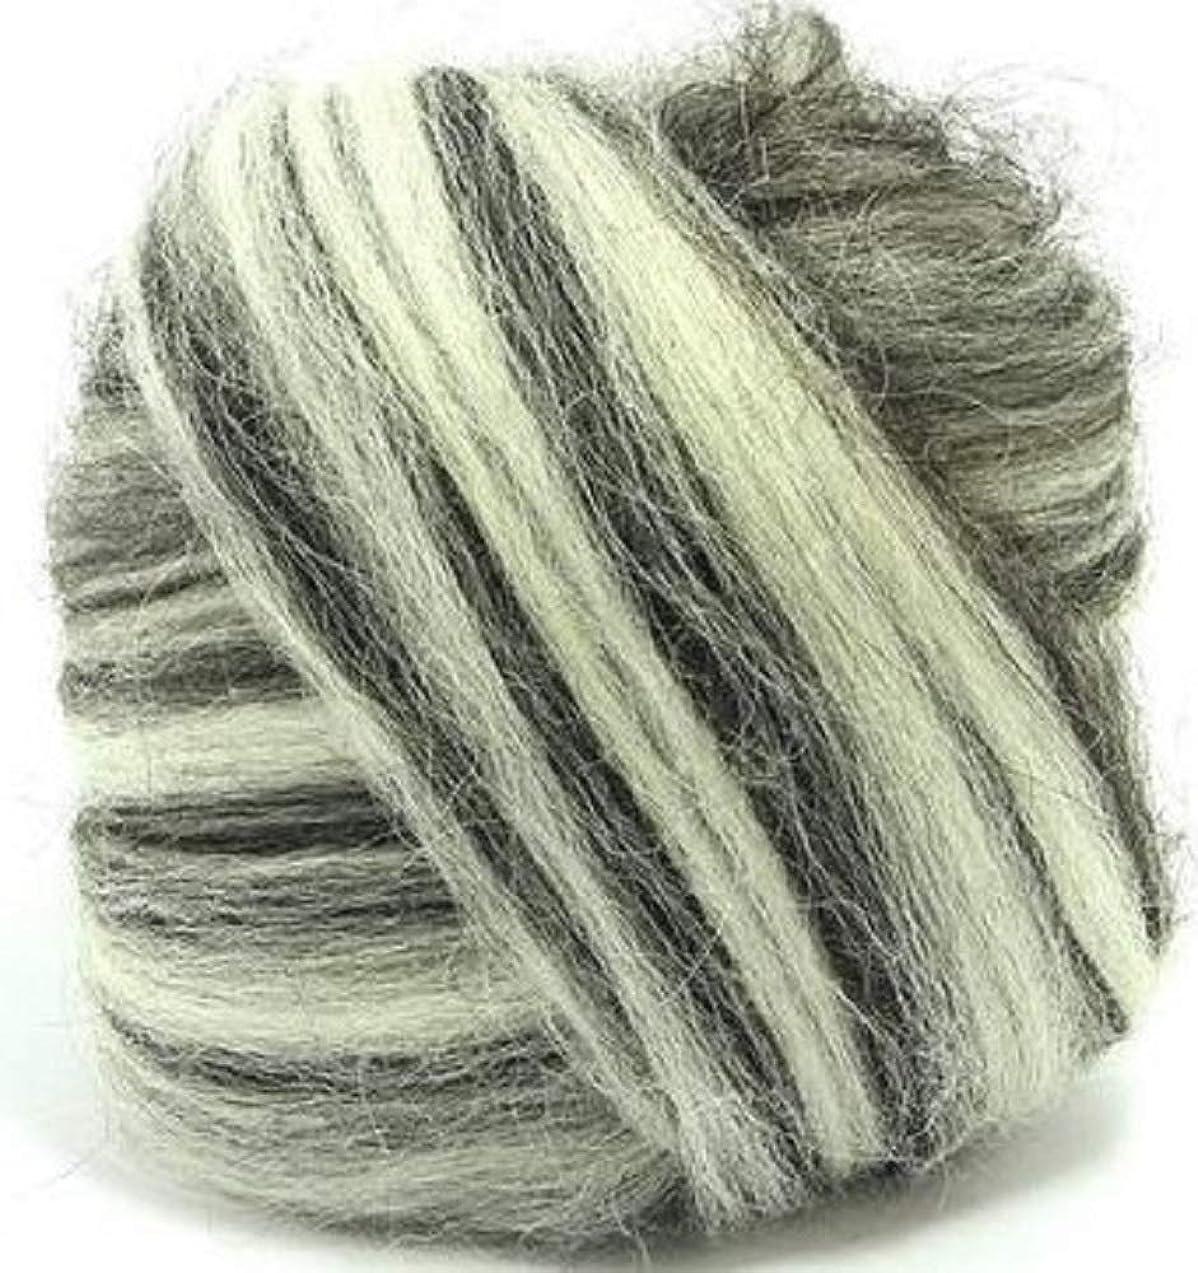 4 oz Paradise Fibers Icelandic Wool Top - Humbug Blend - Perfect for Woolen Yarn & Needle Felting